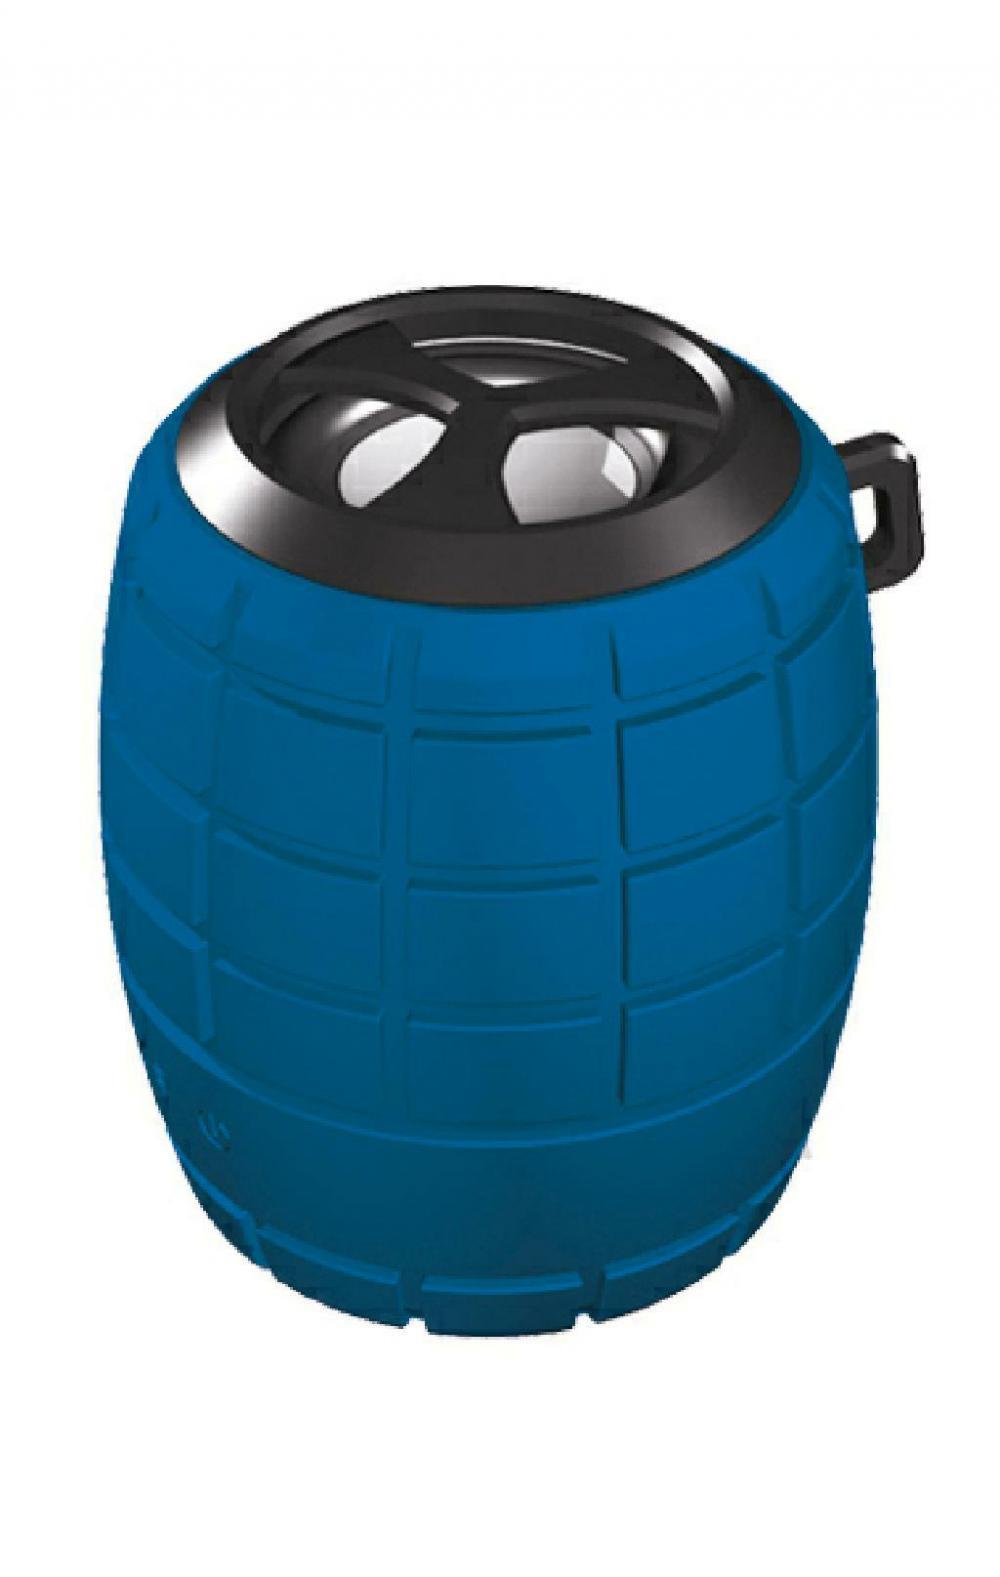 Boxa portabila Cosmo, albastru